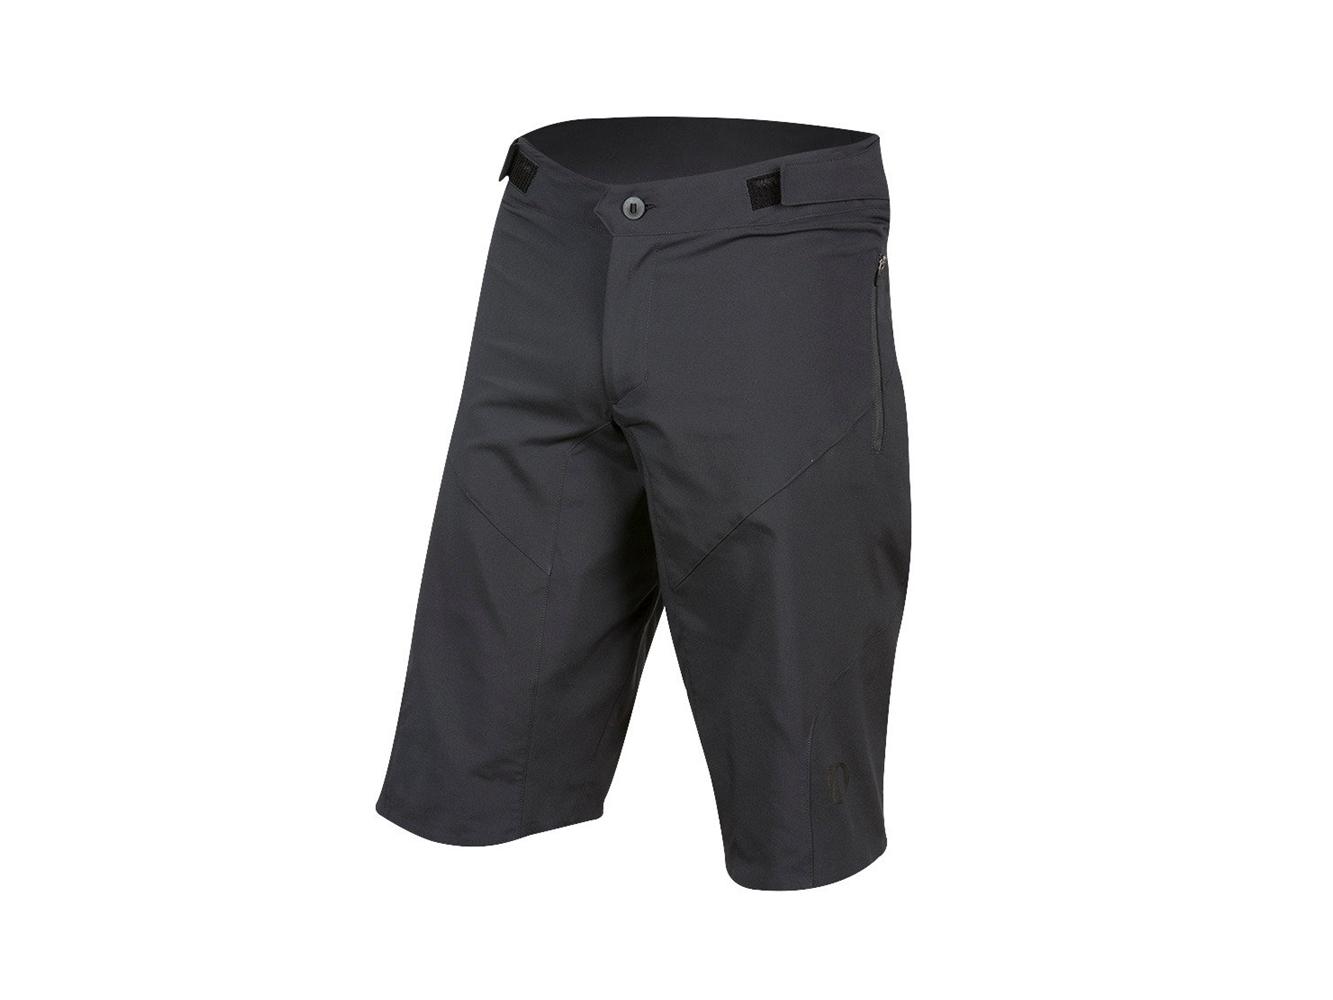 Pearl Izumi Shorts Rove Marin 34